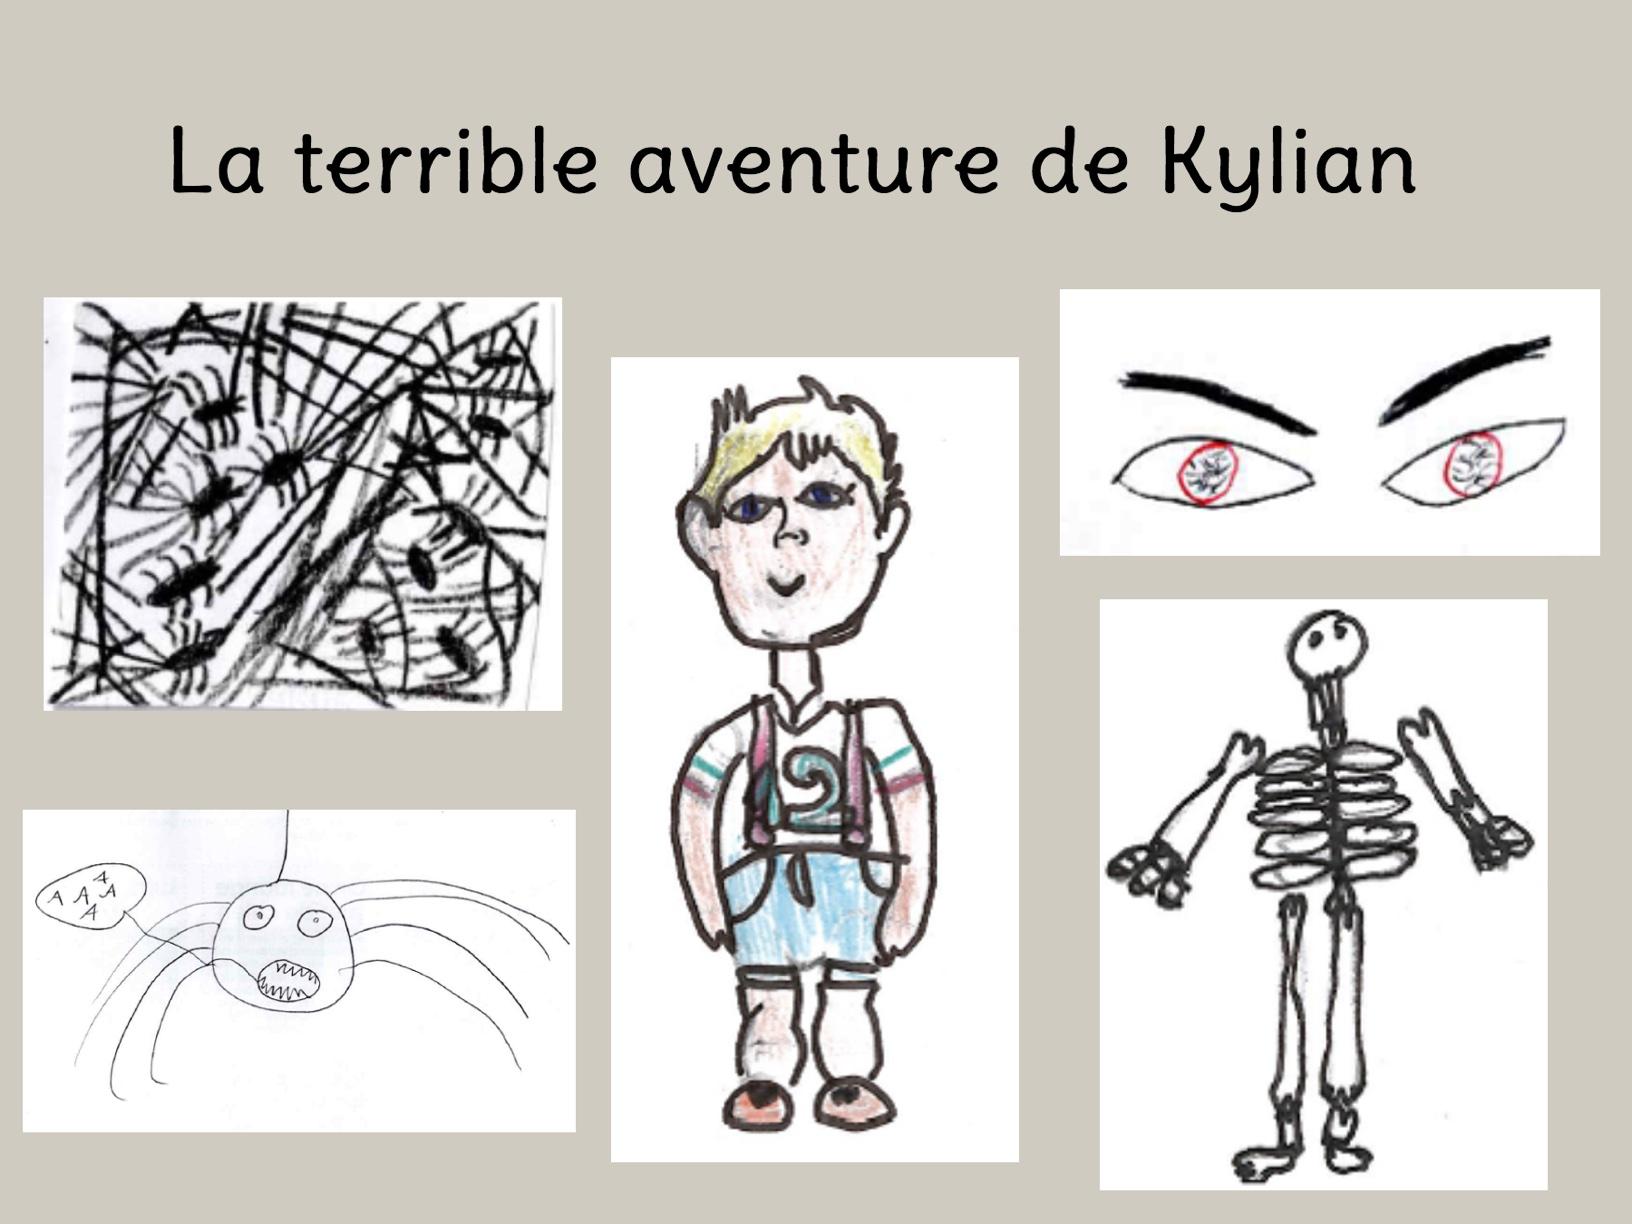 La terrible aventure de Kylian